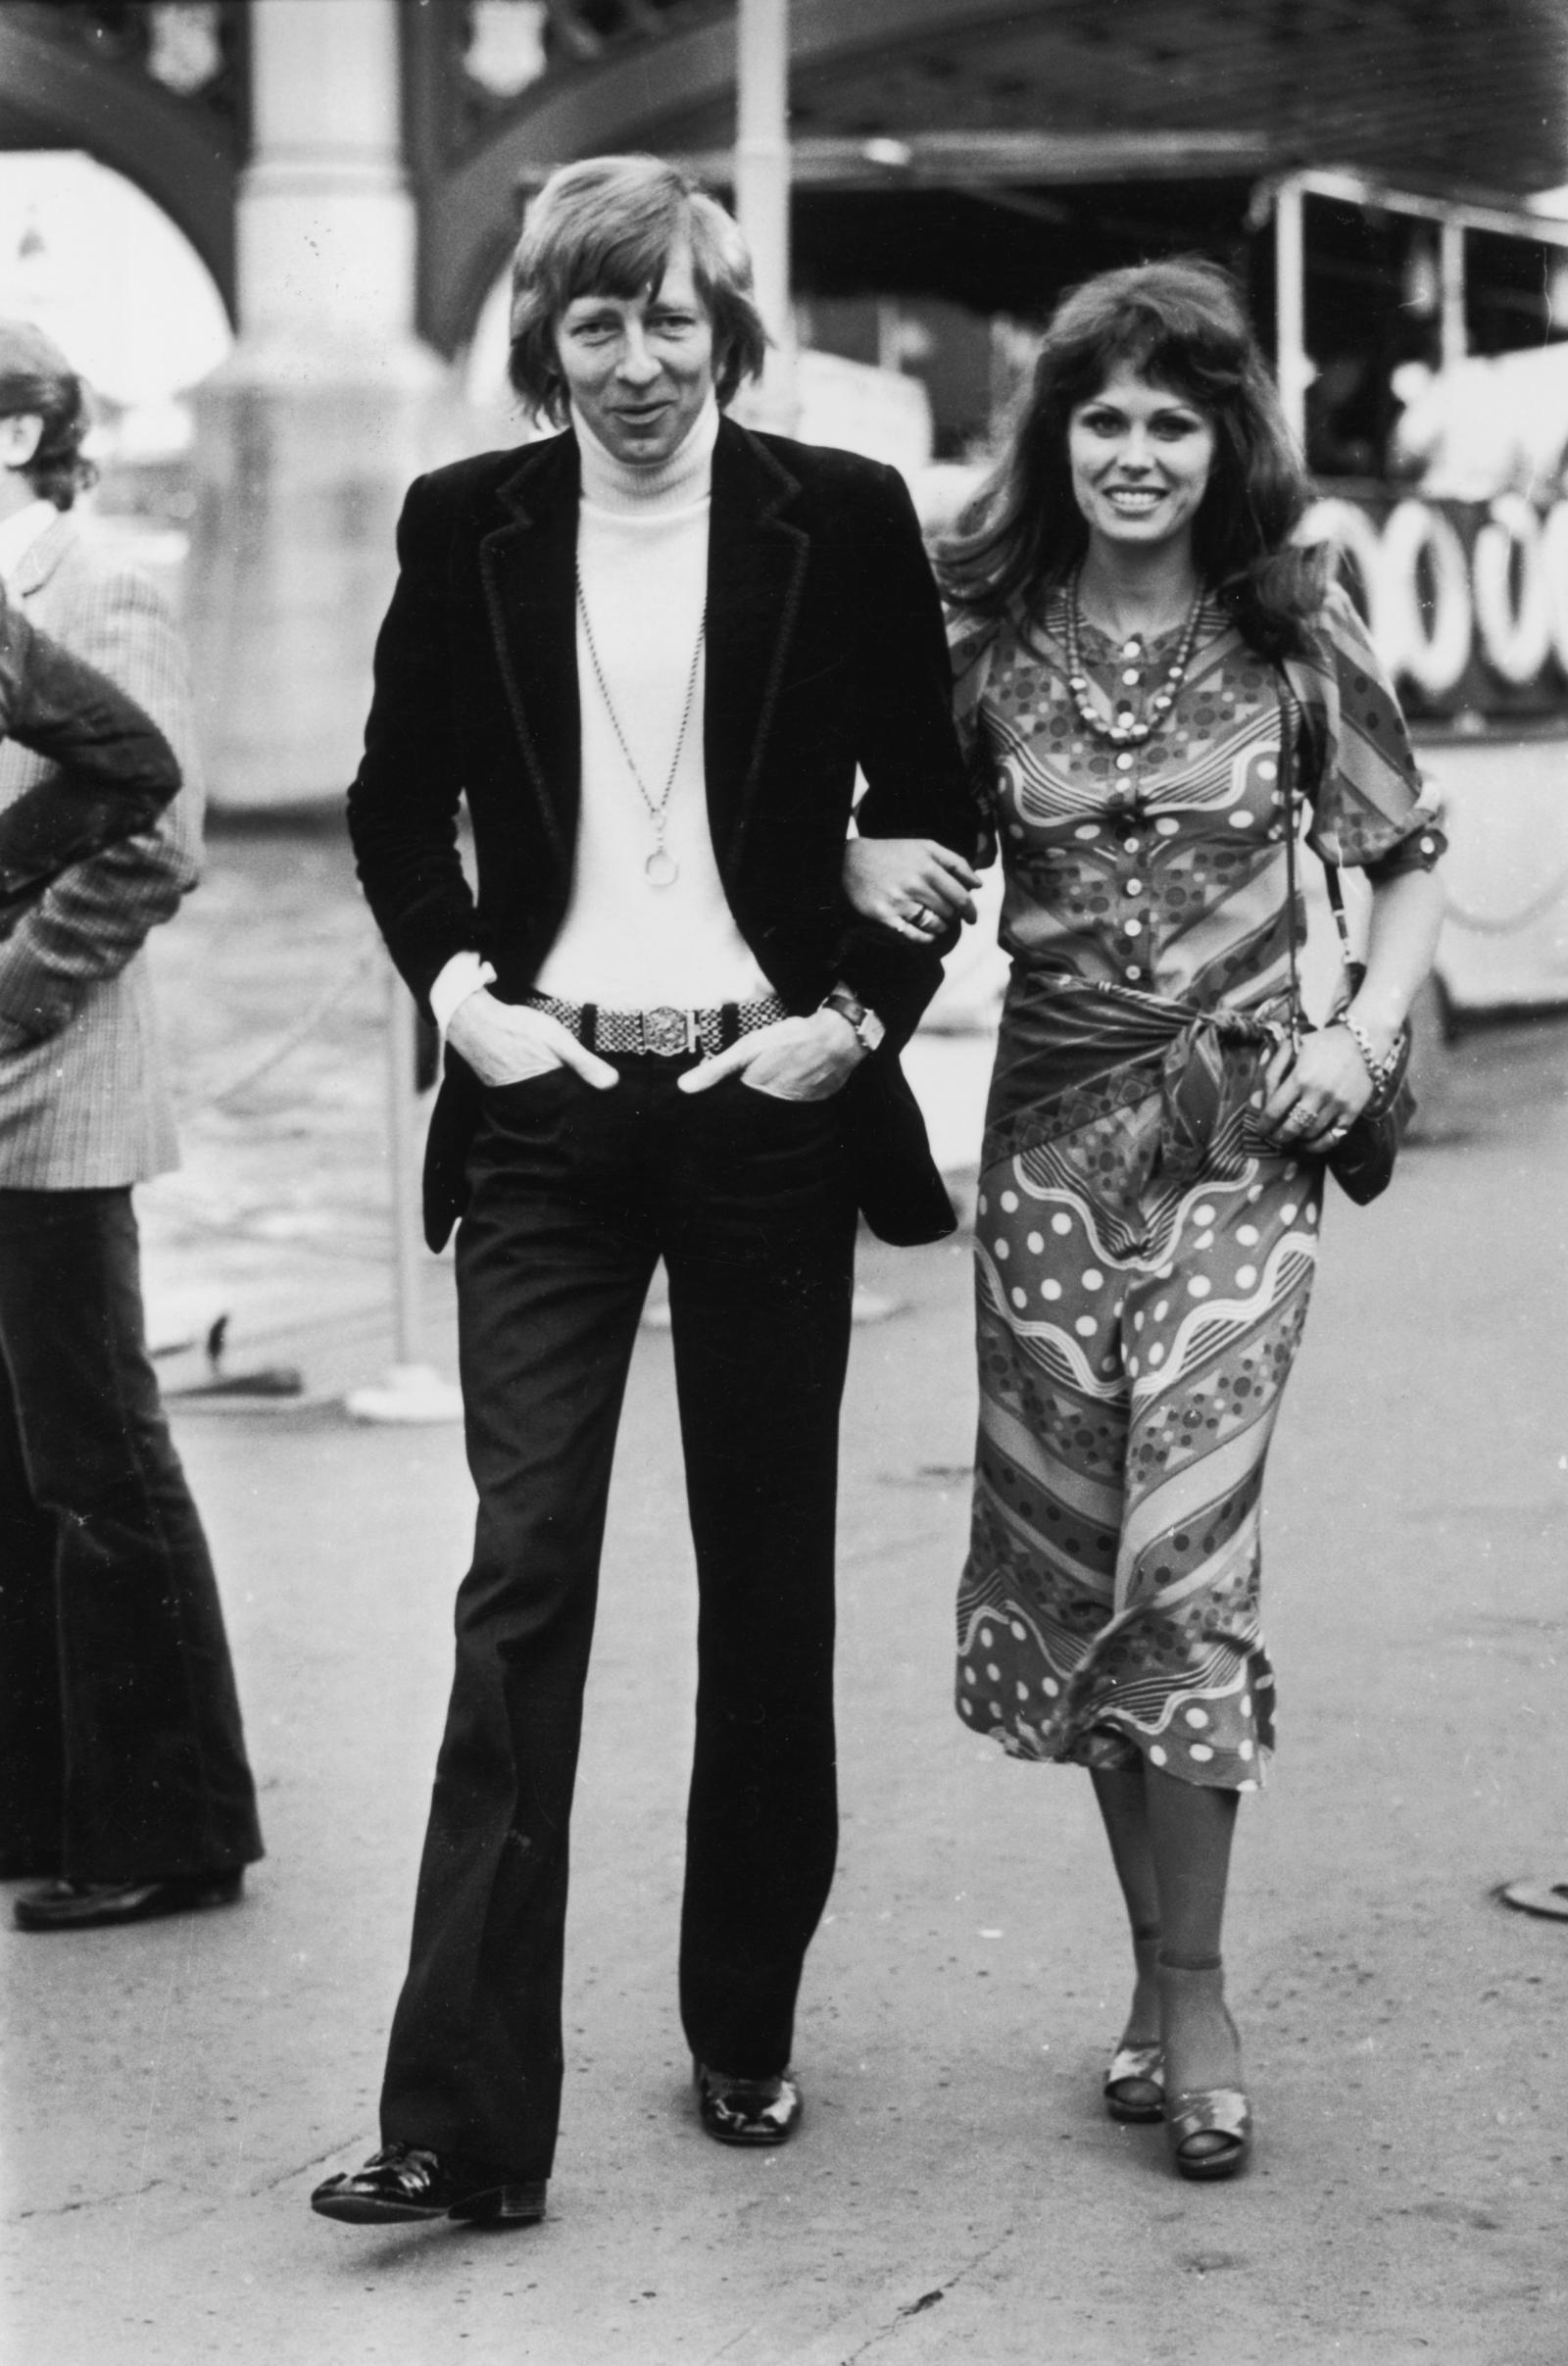 British actress, Joanna Lumley and her ex-husband, actor, Jeremy Lloyd.